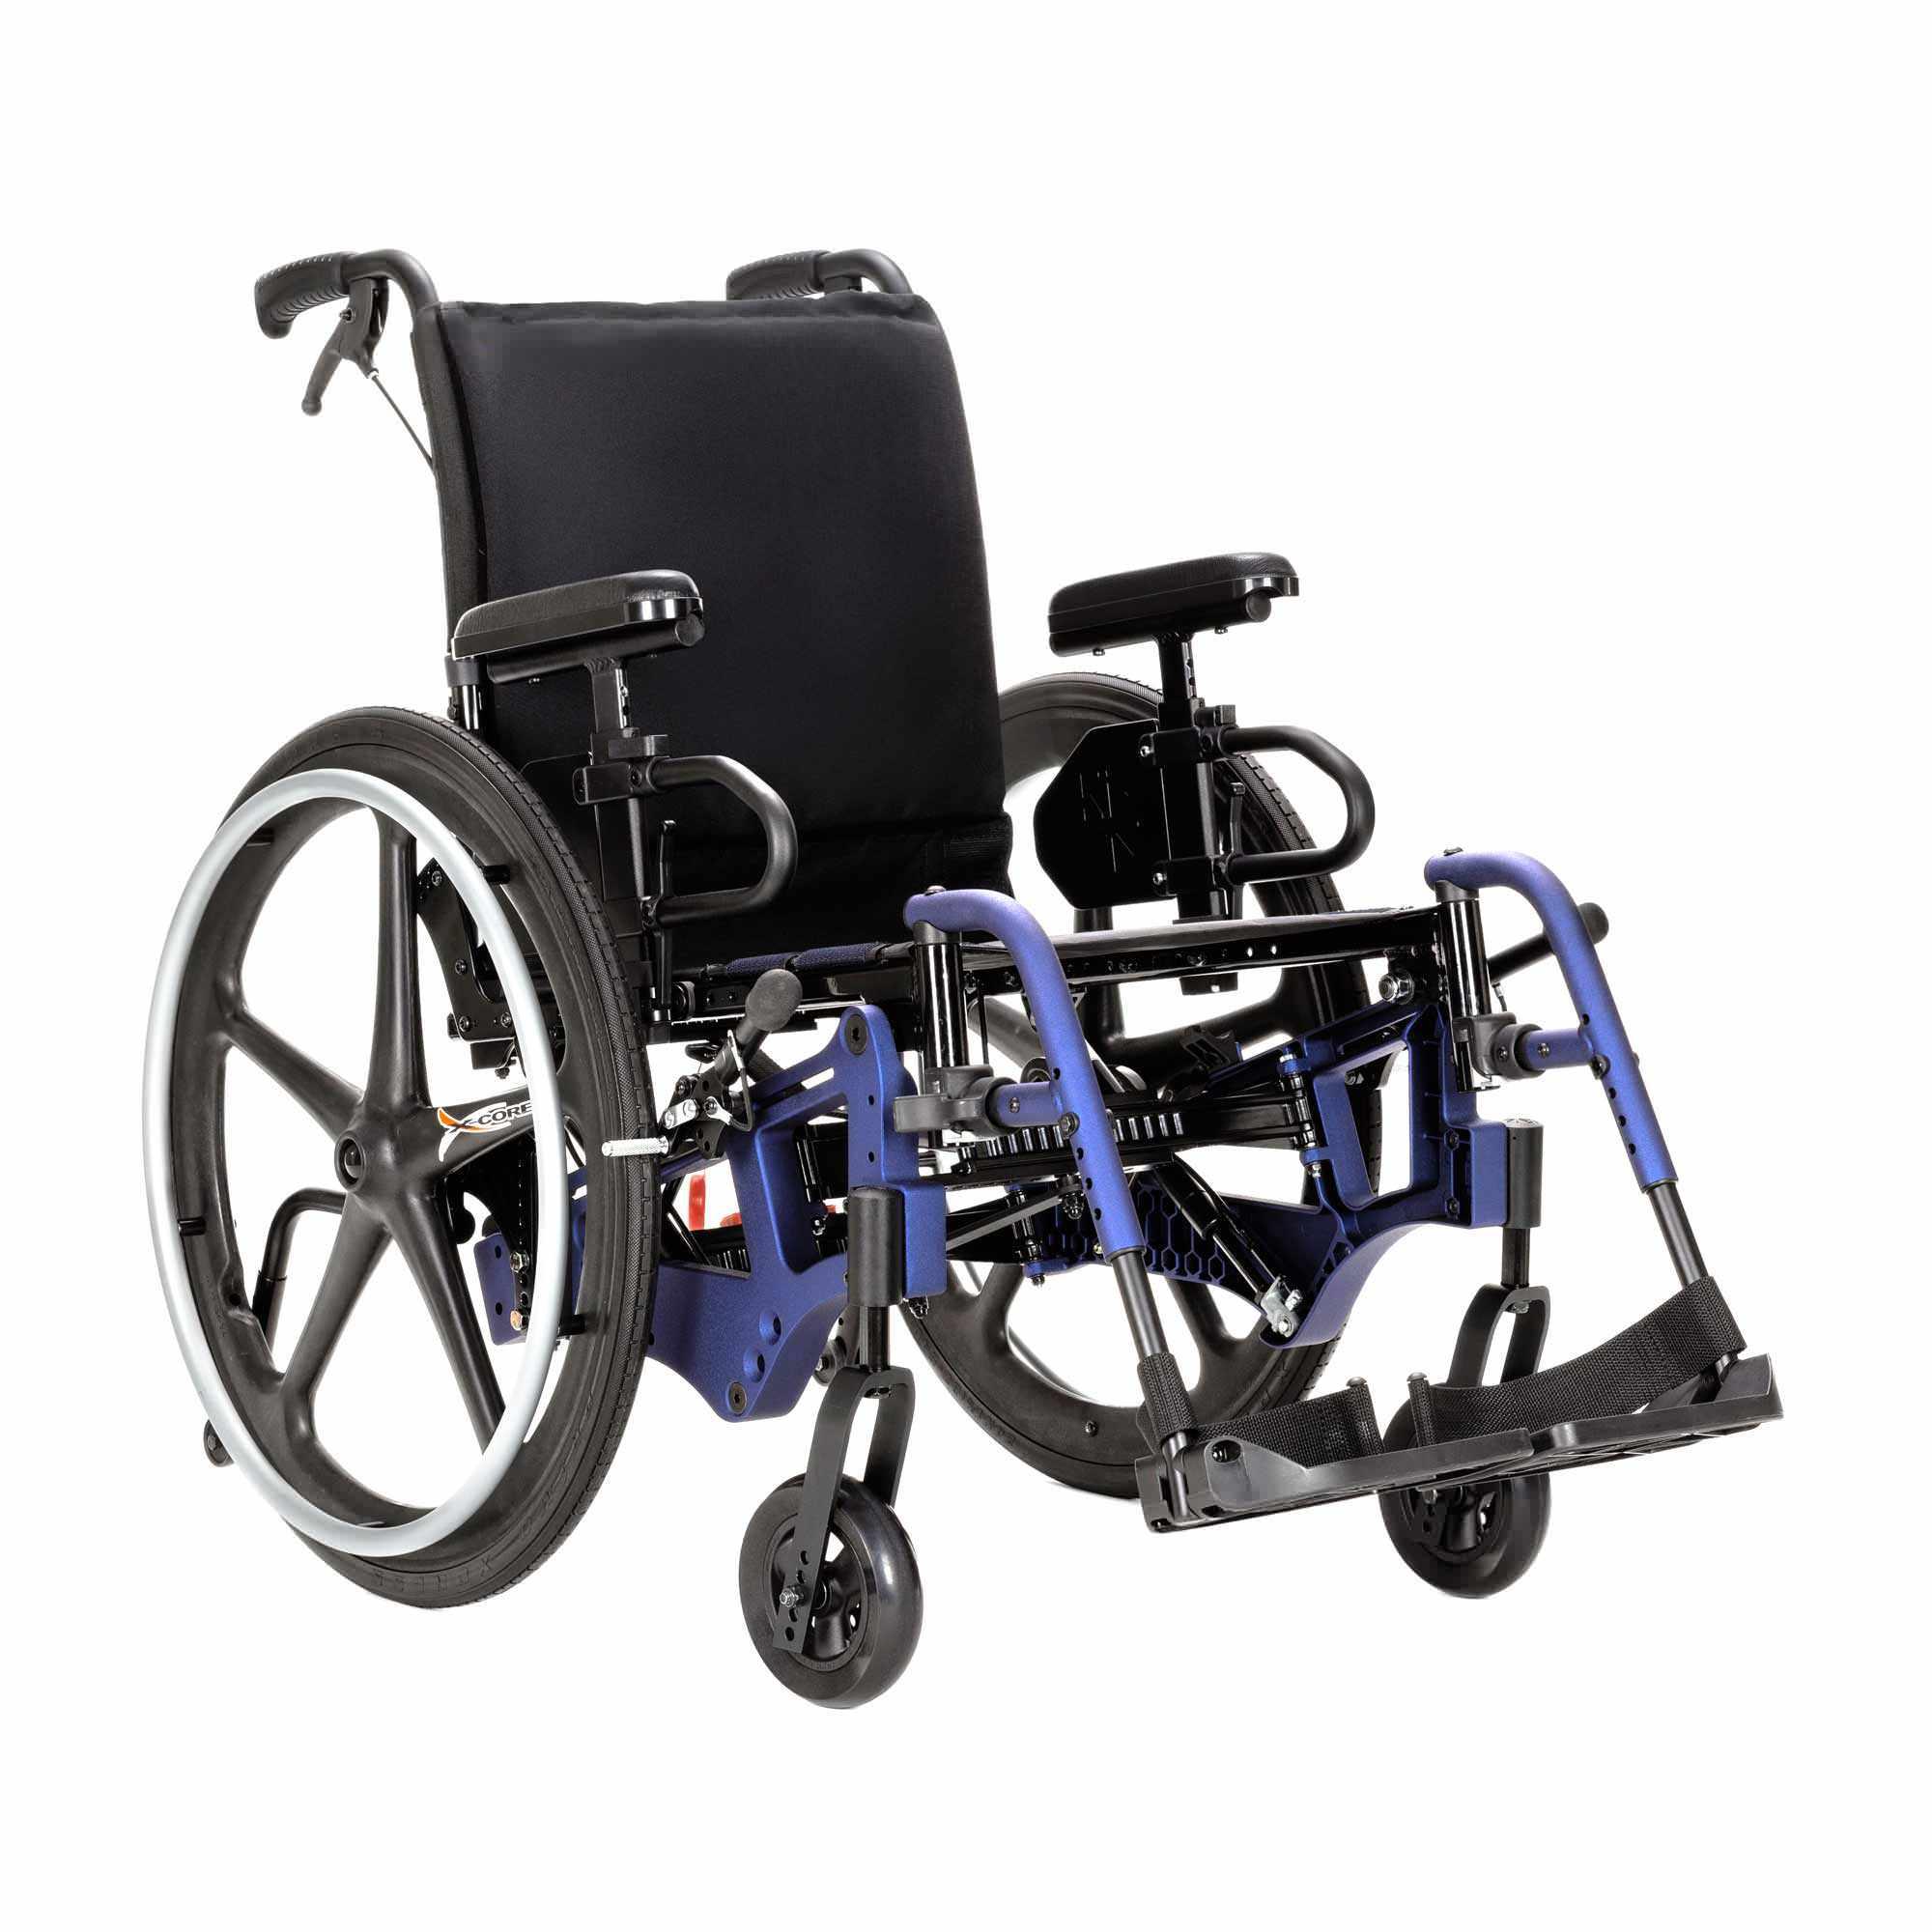 Ki mobility Liberty FT tilt wheelchair - Quickship